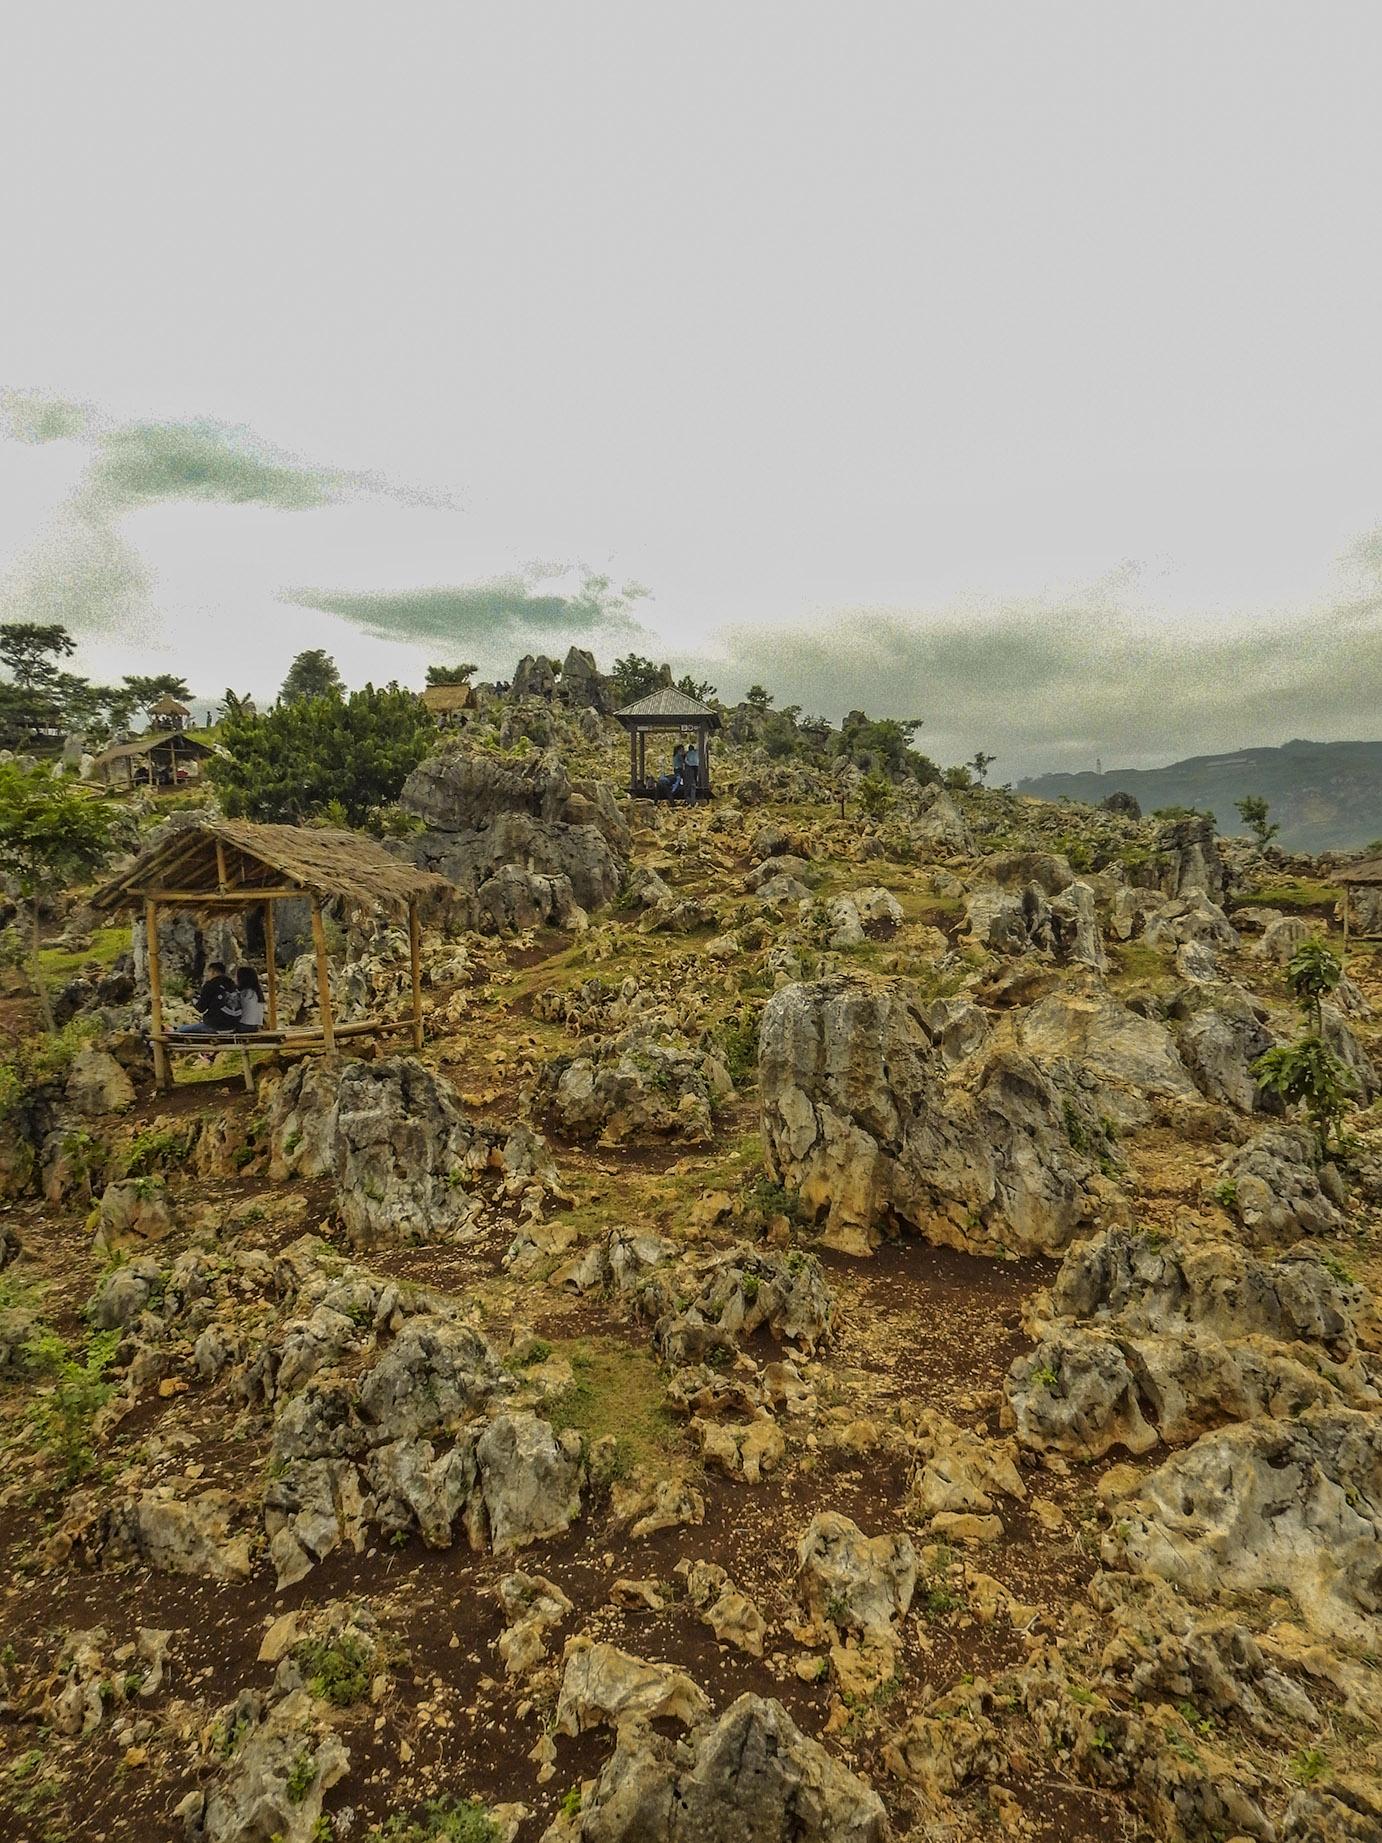 stone garden yang sering menjadi objek foto instagram